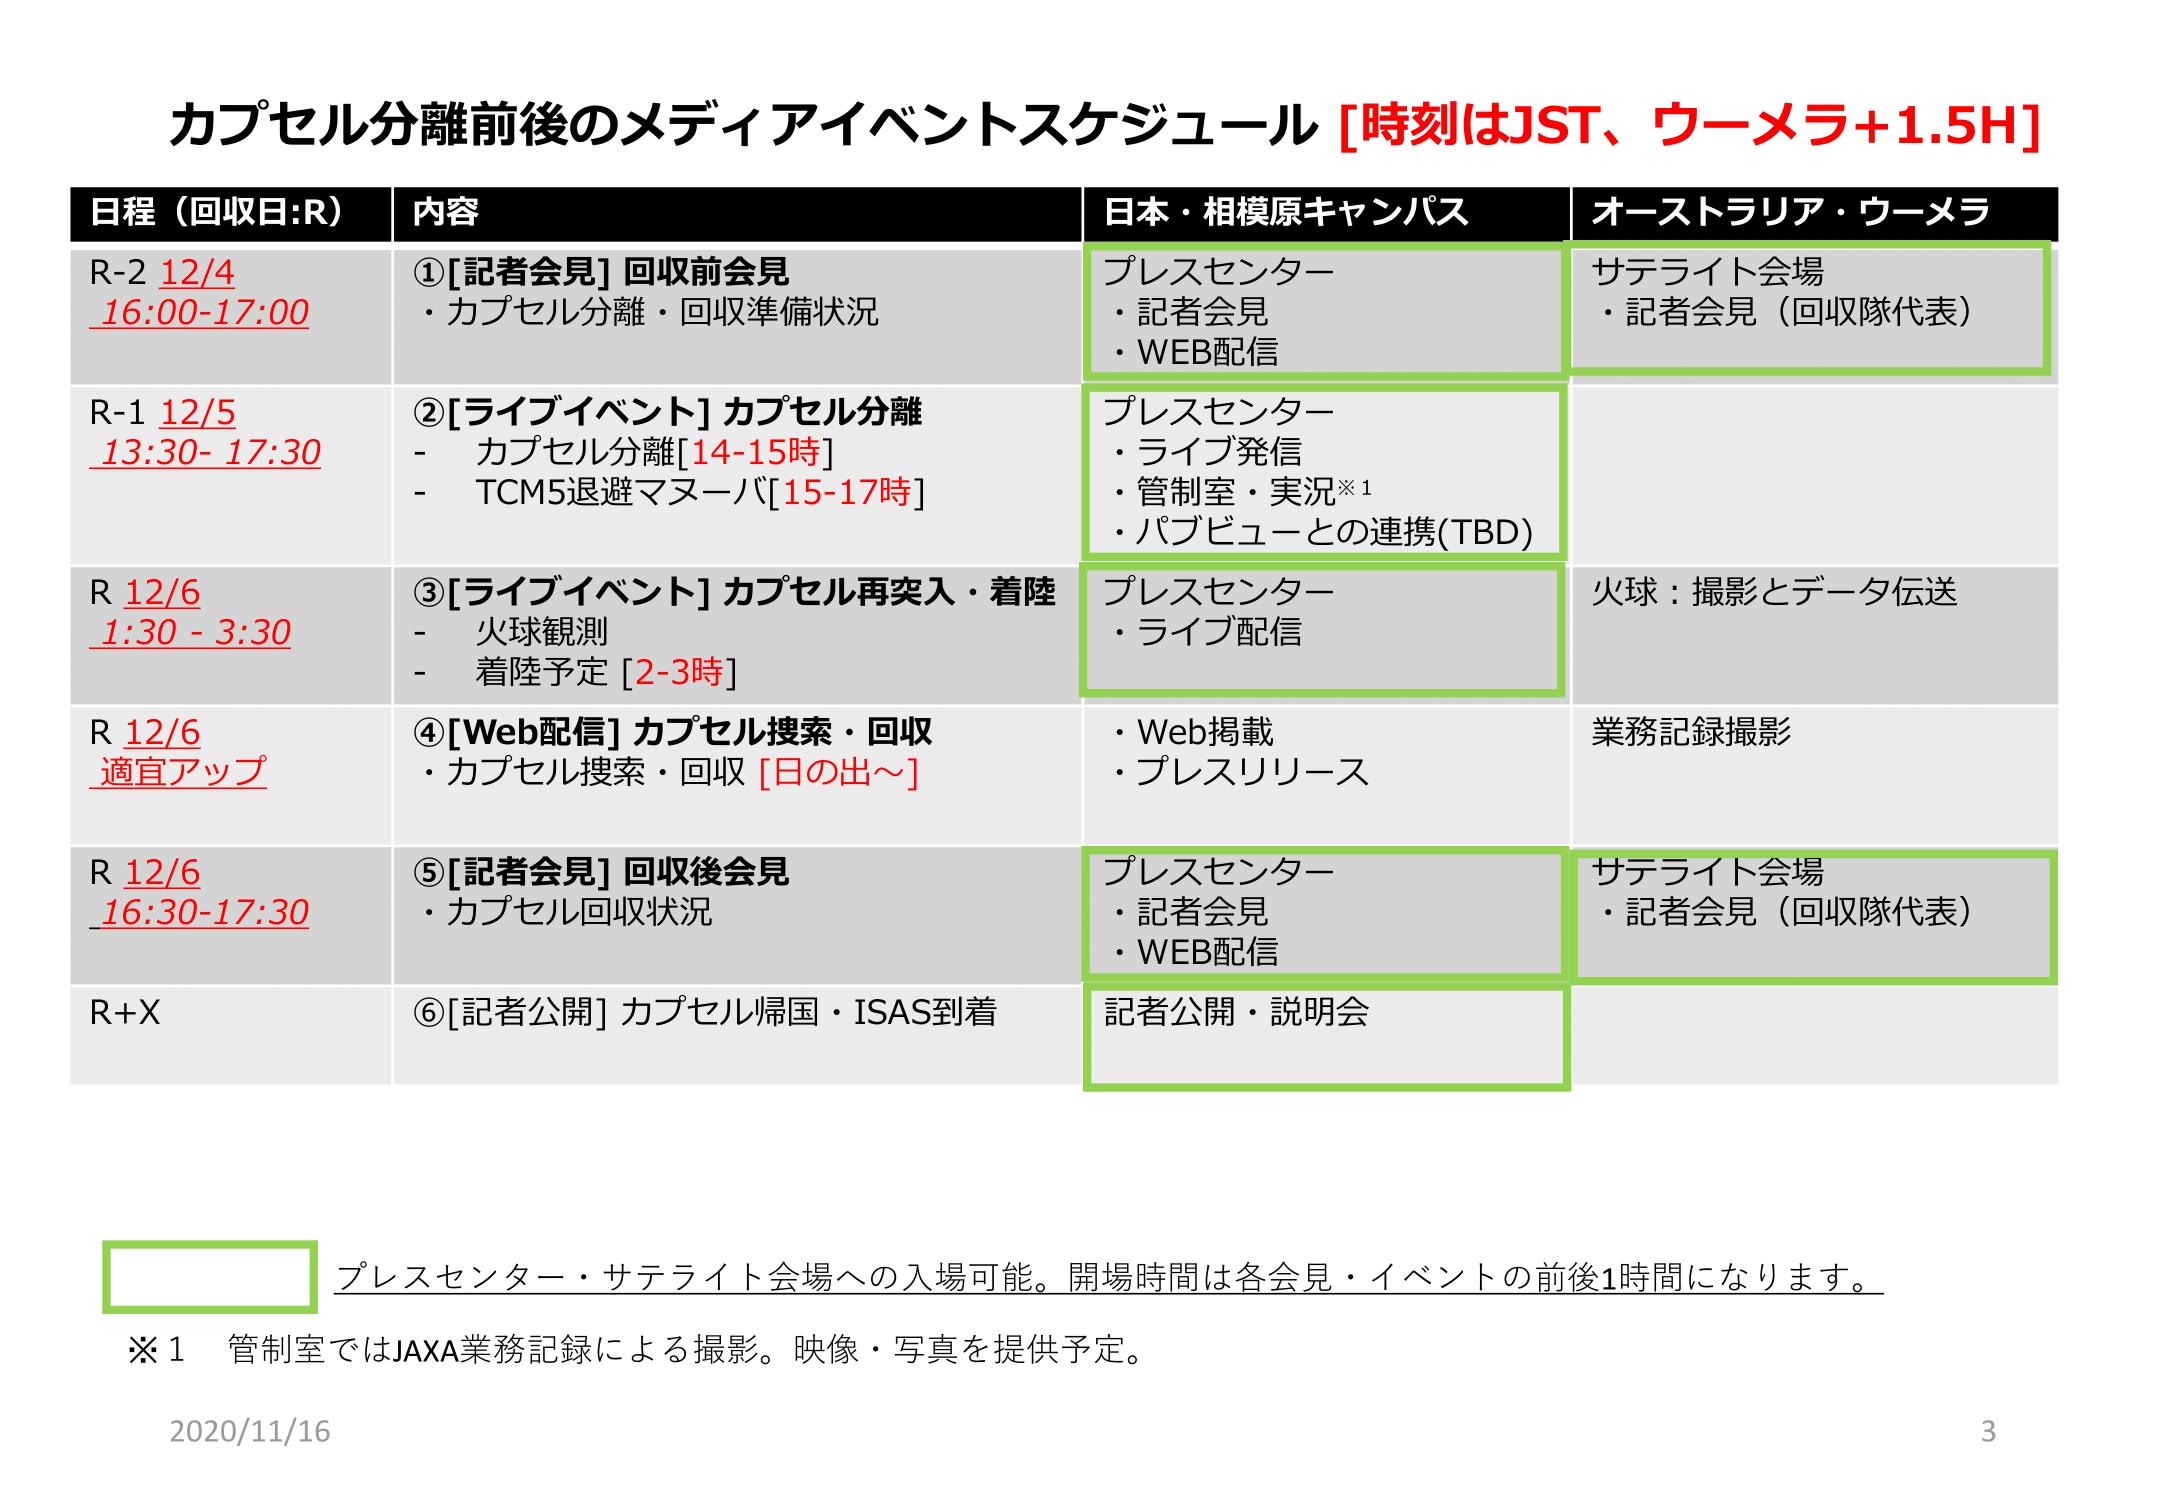 f:id:Imamura:20201117222156p:plain